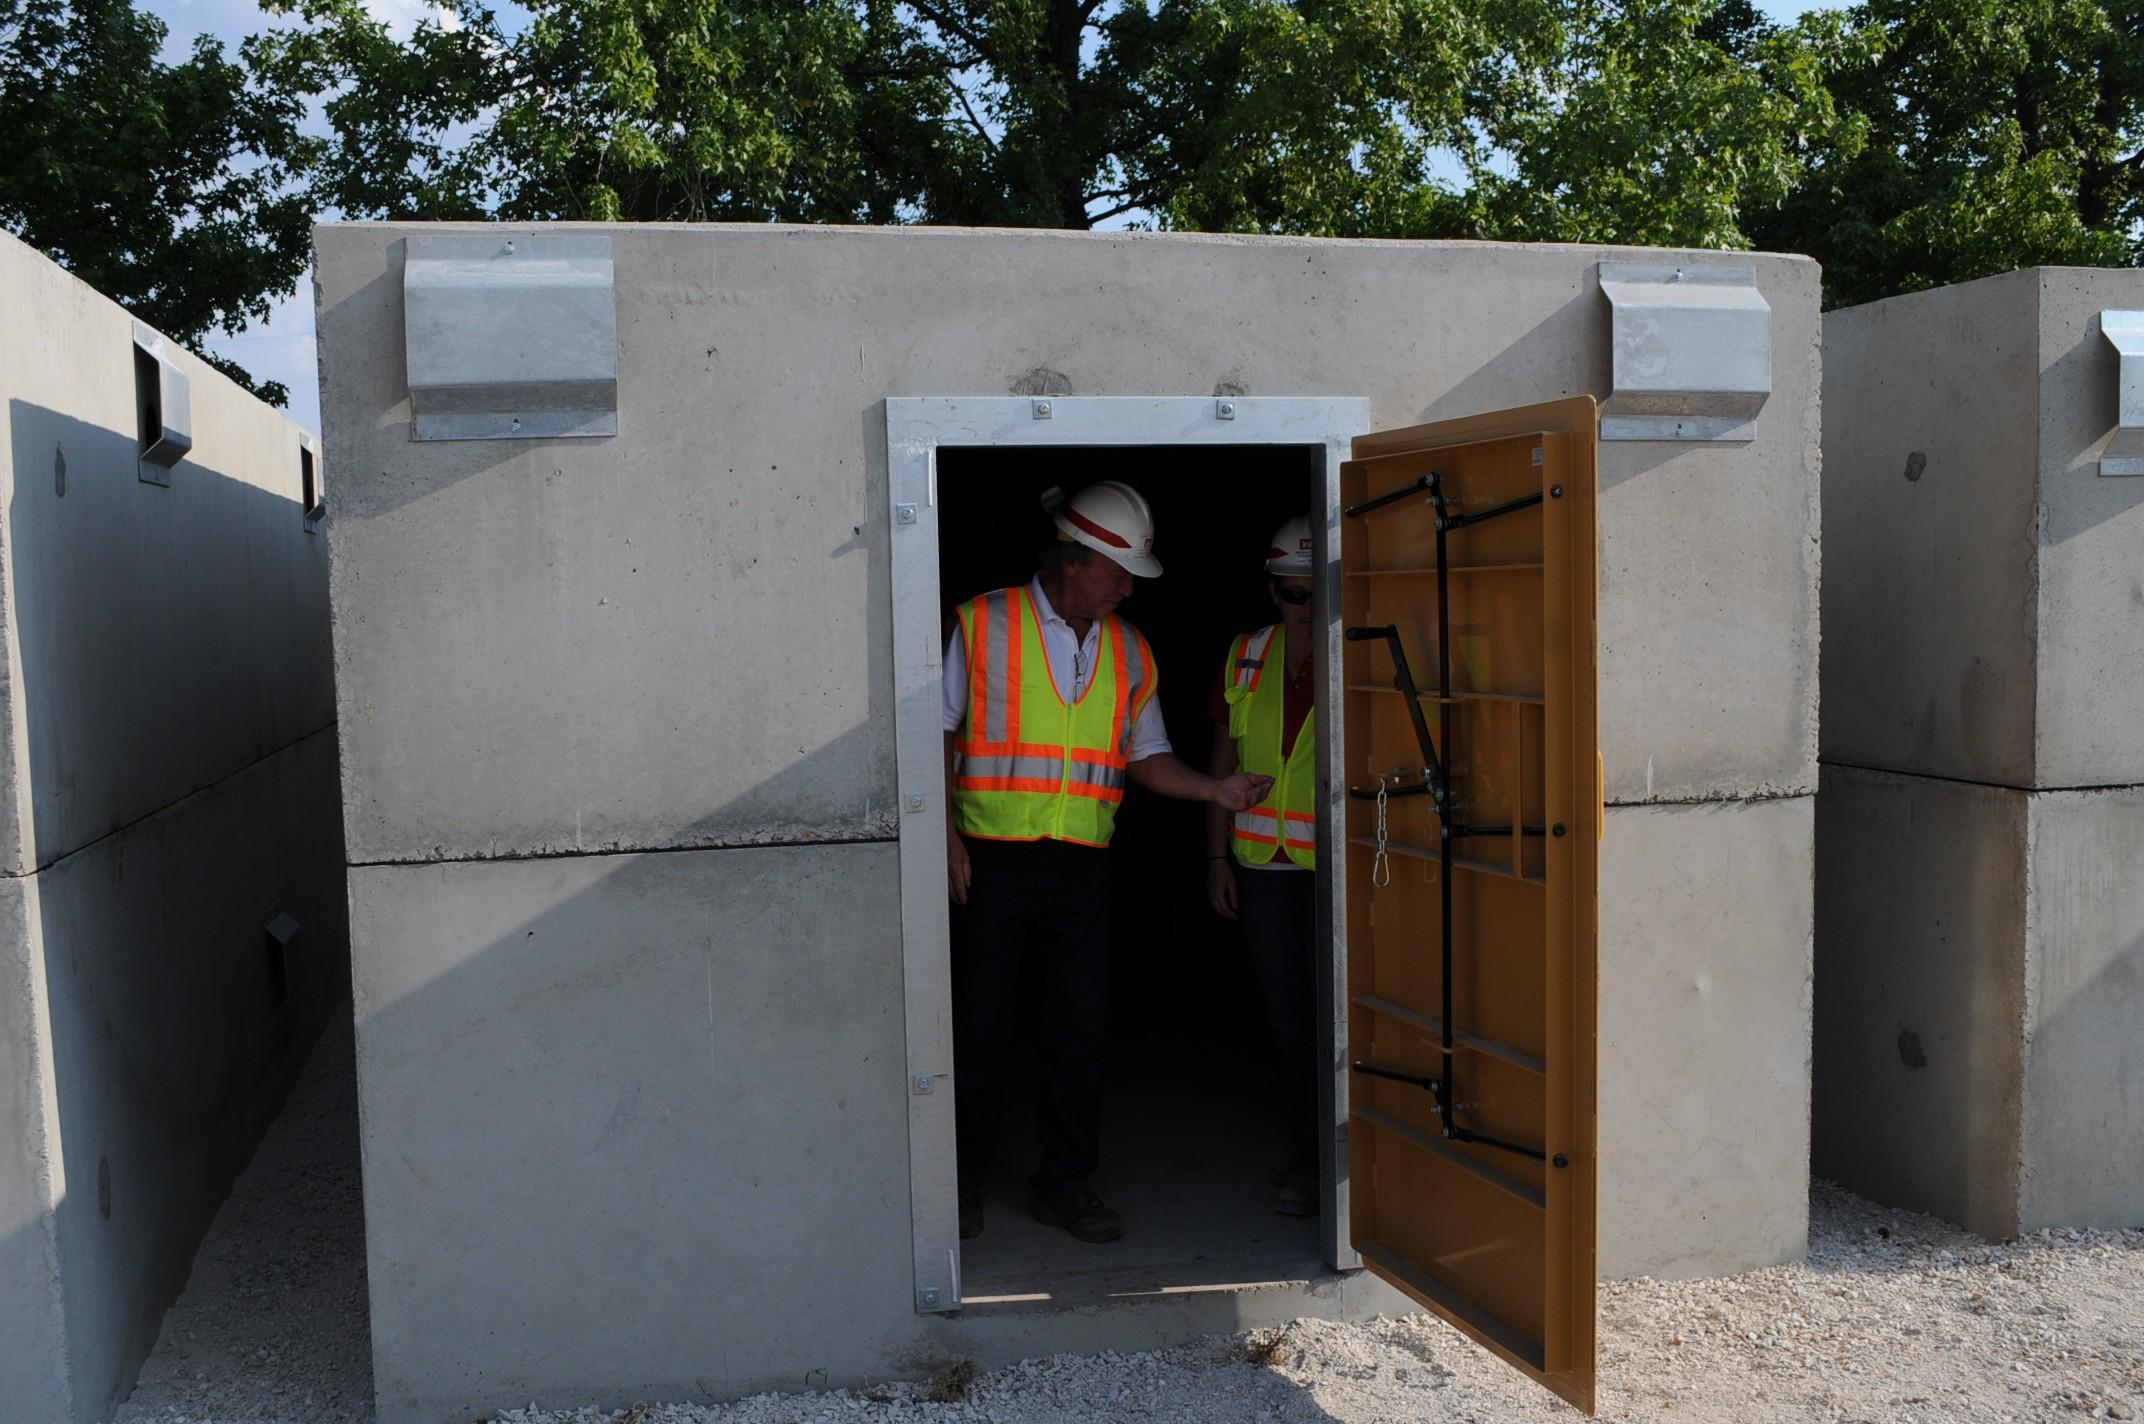 Corps Of Engineers Helps Joplin Recover After Devastating